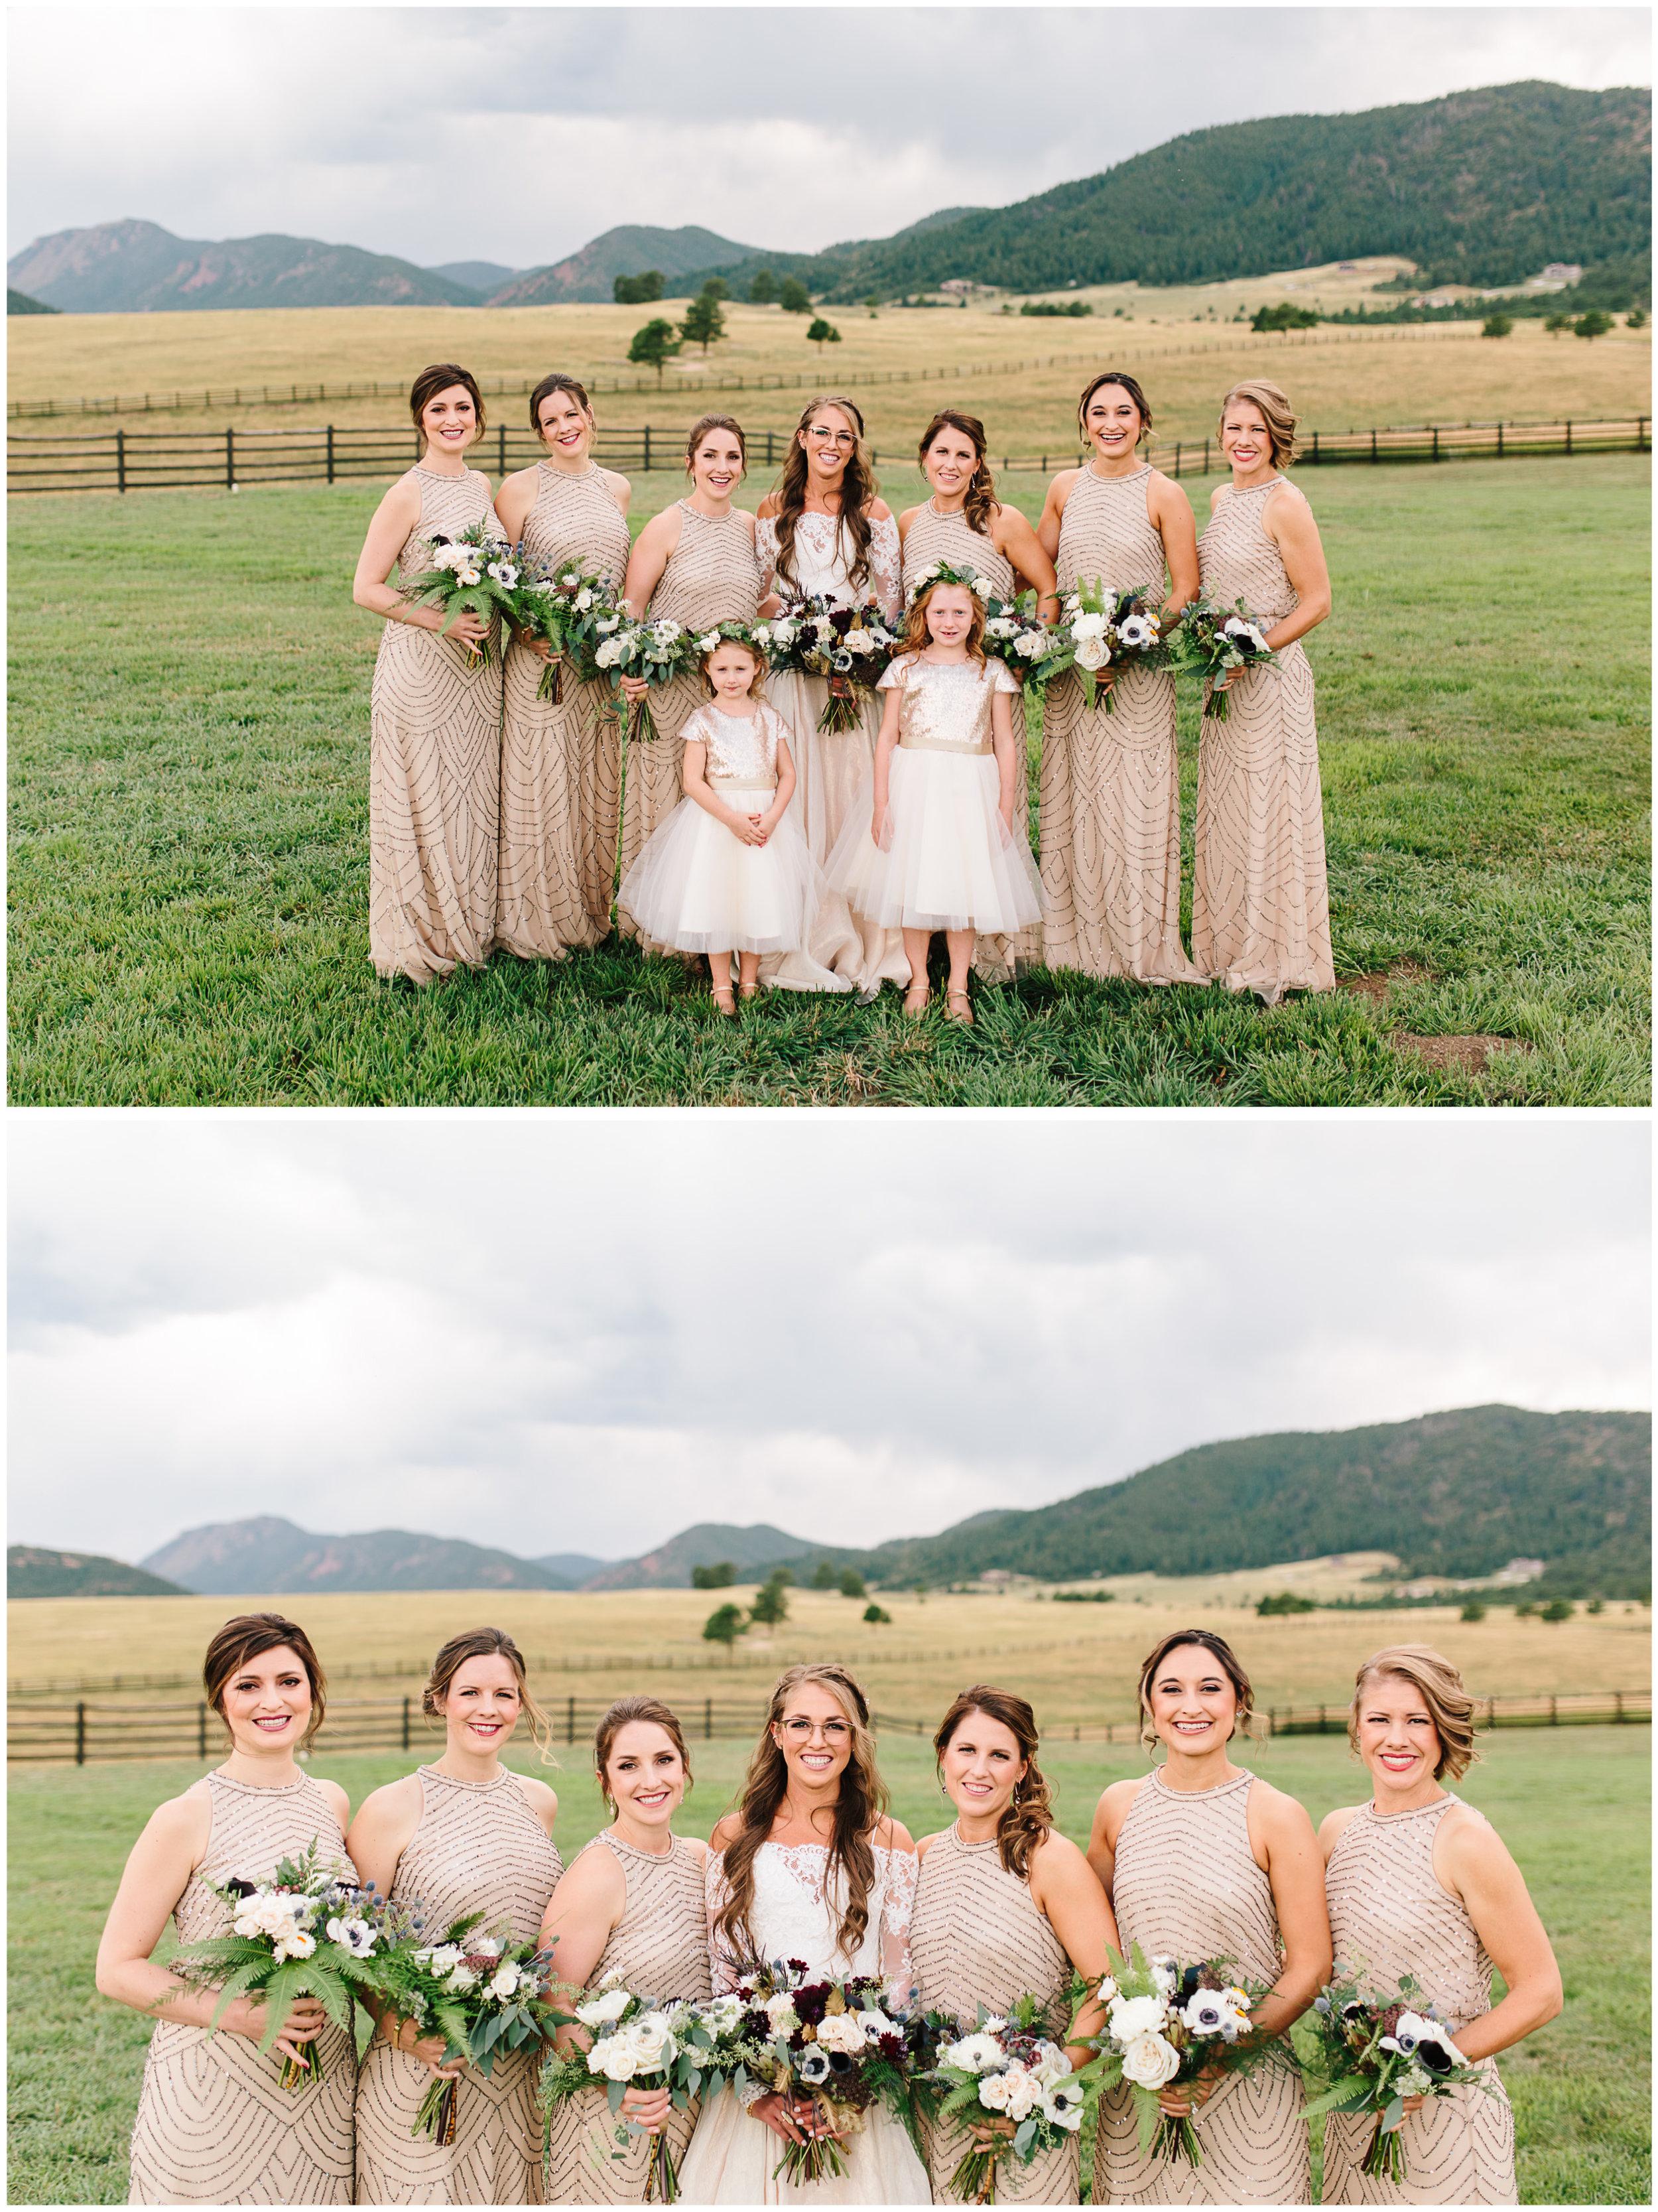 spruce_mountain_ranch_wedding_36.jpg